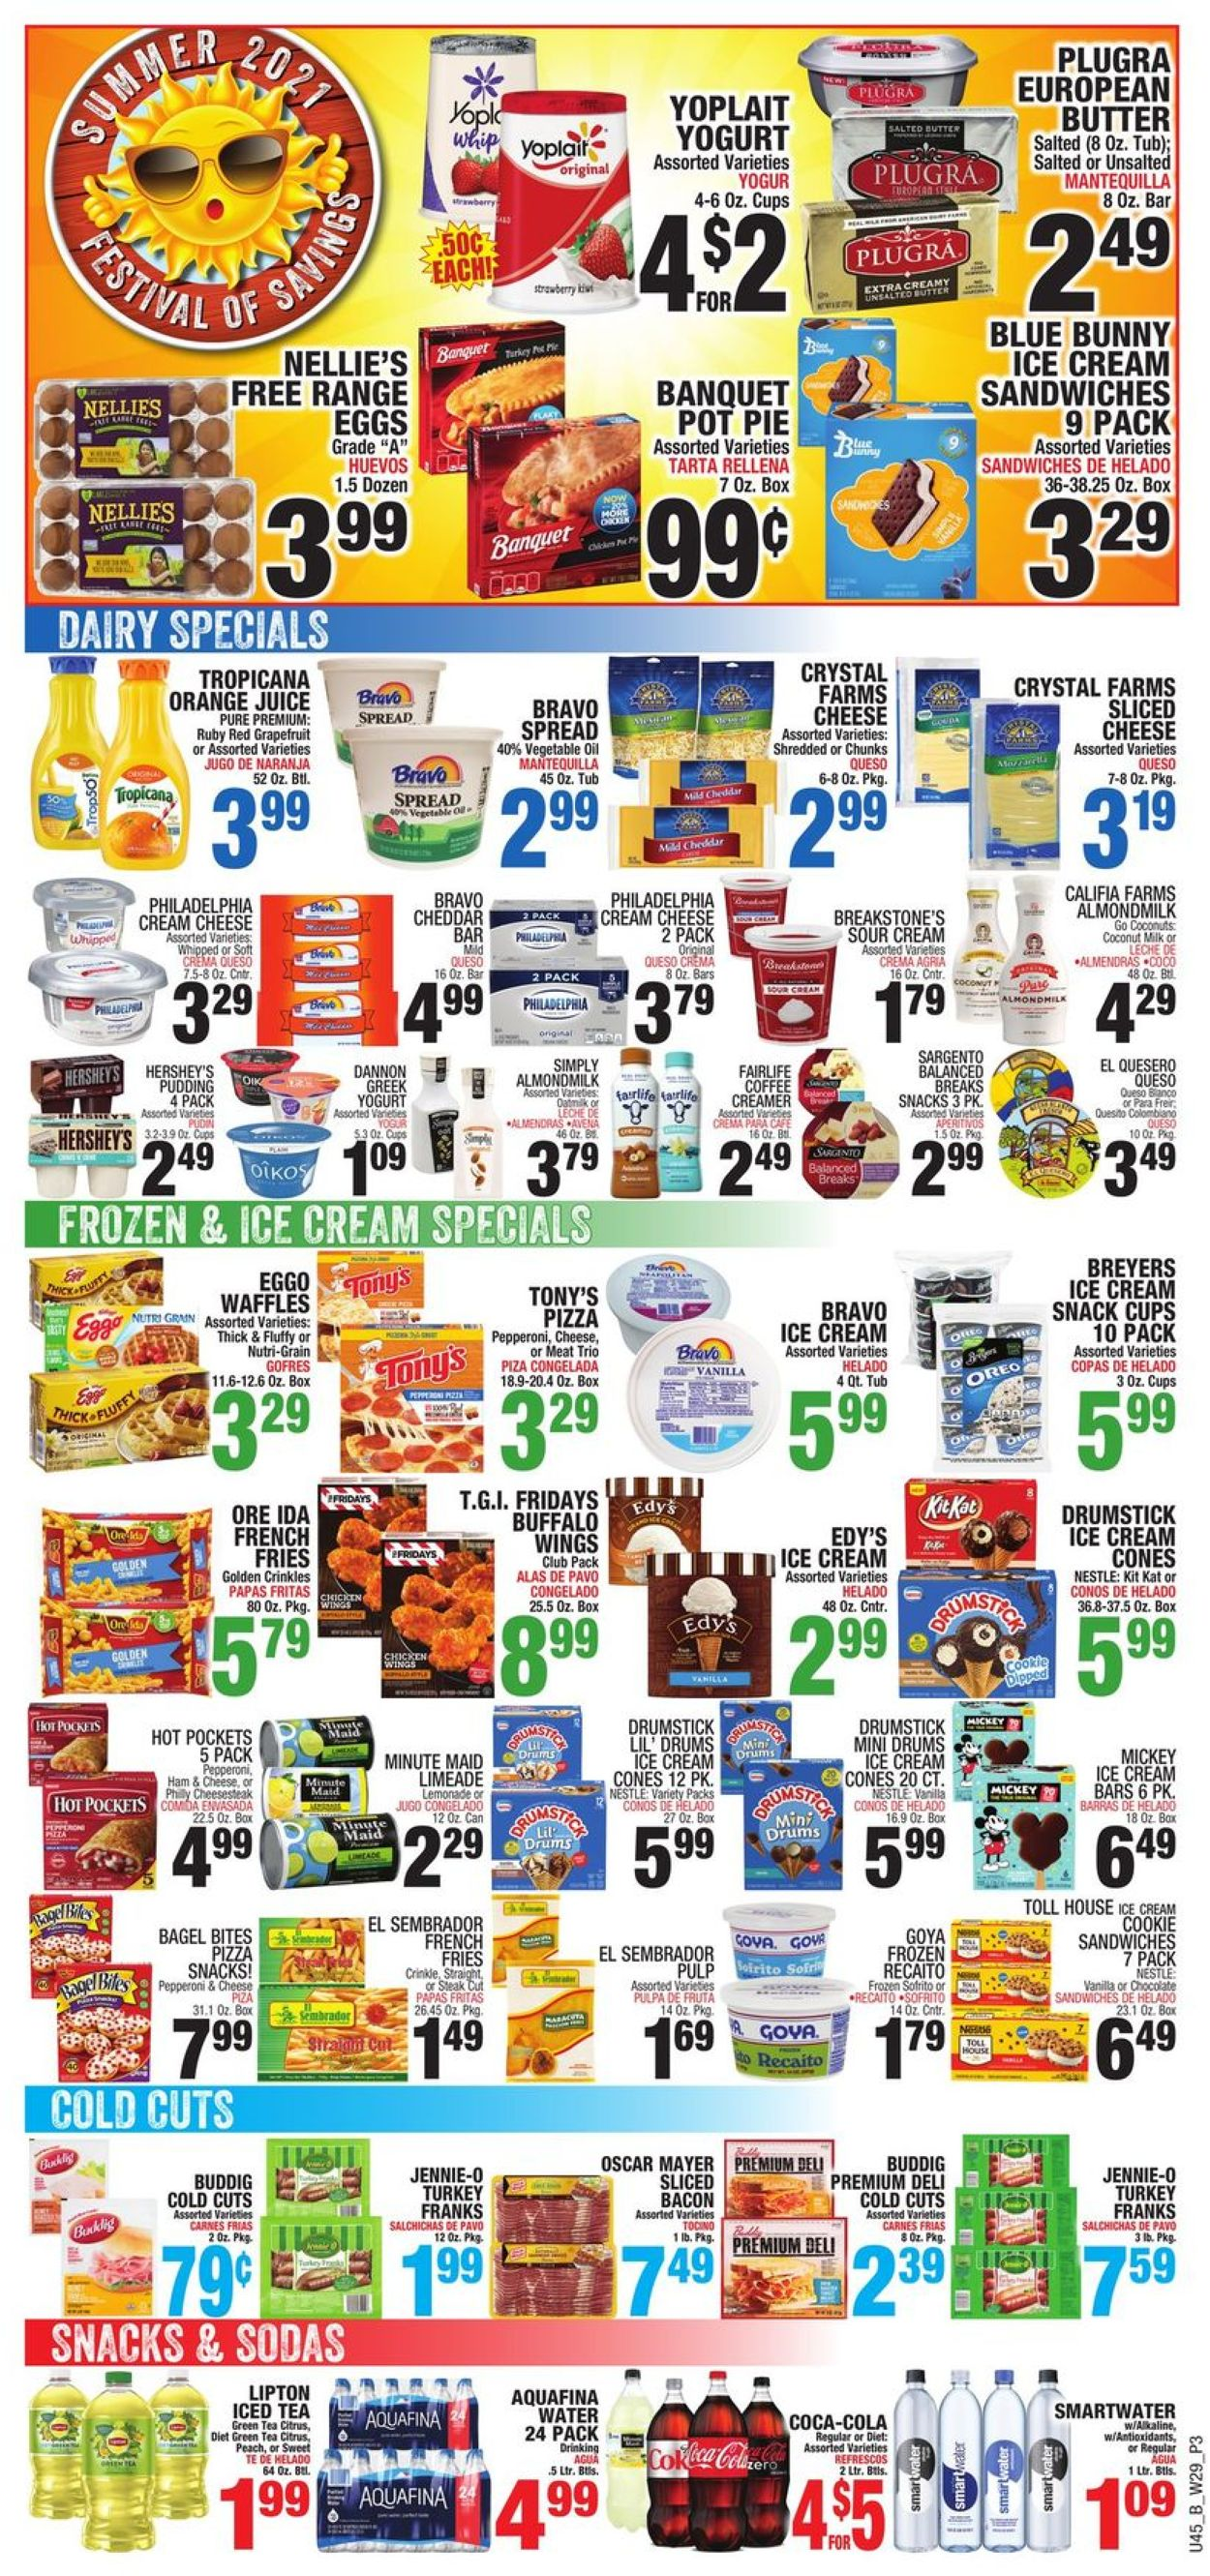 Bravo Supermarkets Weekly Ad Circular - valid 07/15-07/21/2021 (Page 3)